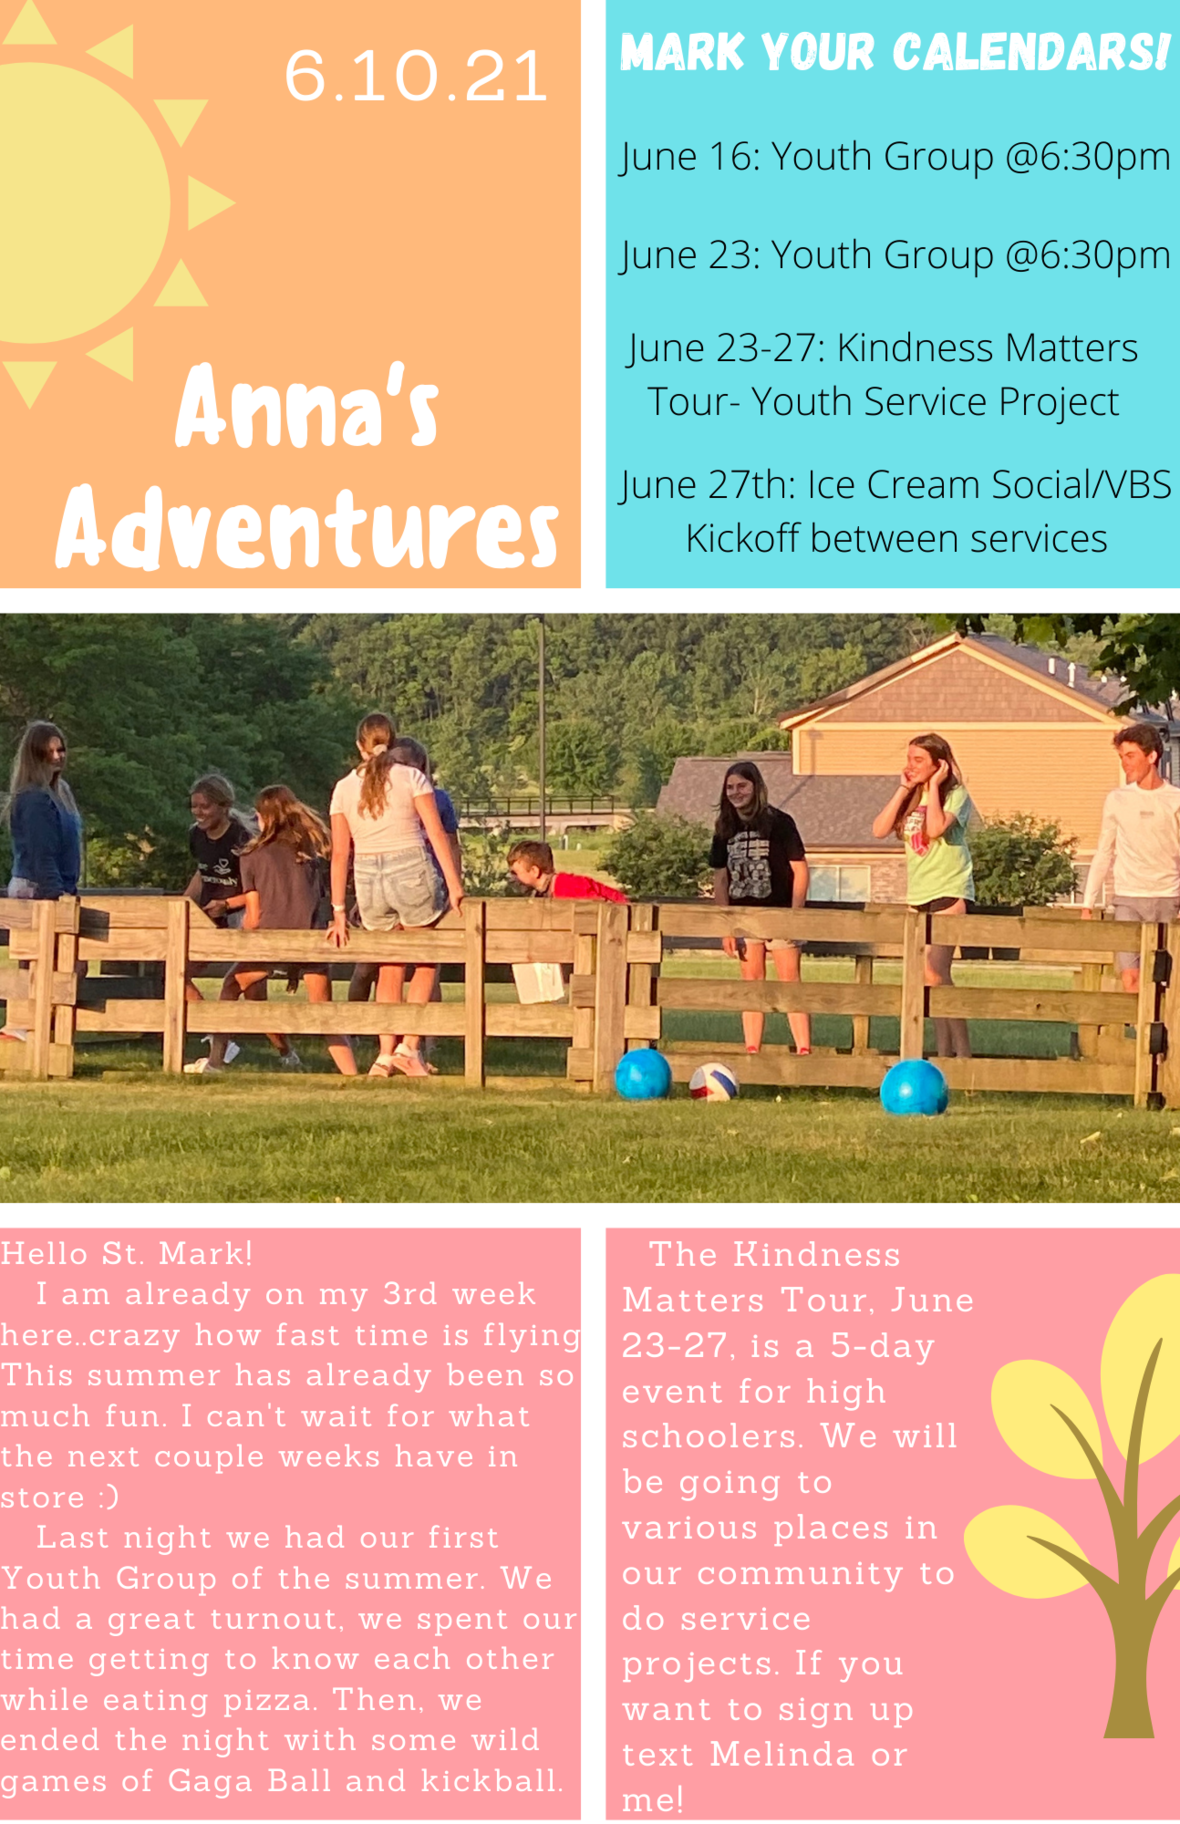 anna s adventures 6.10.21